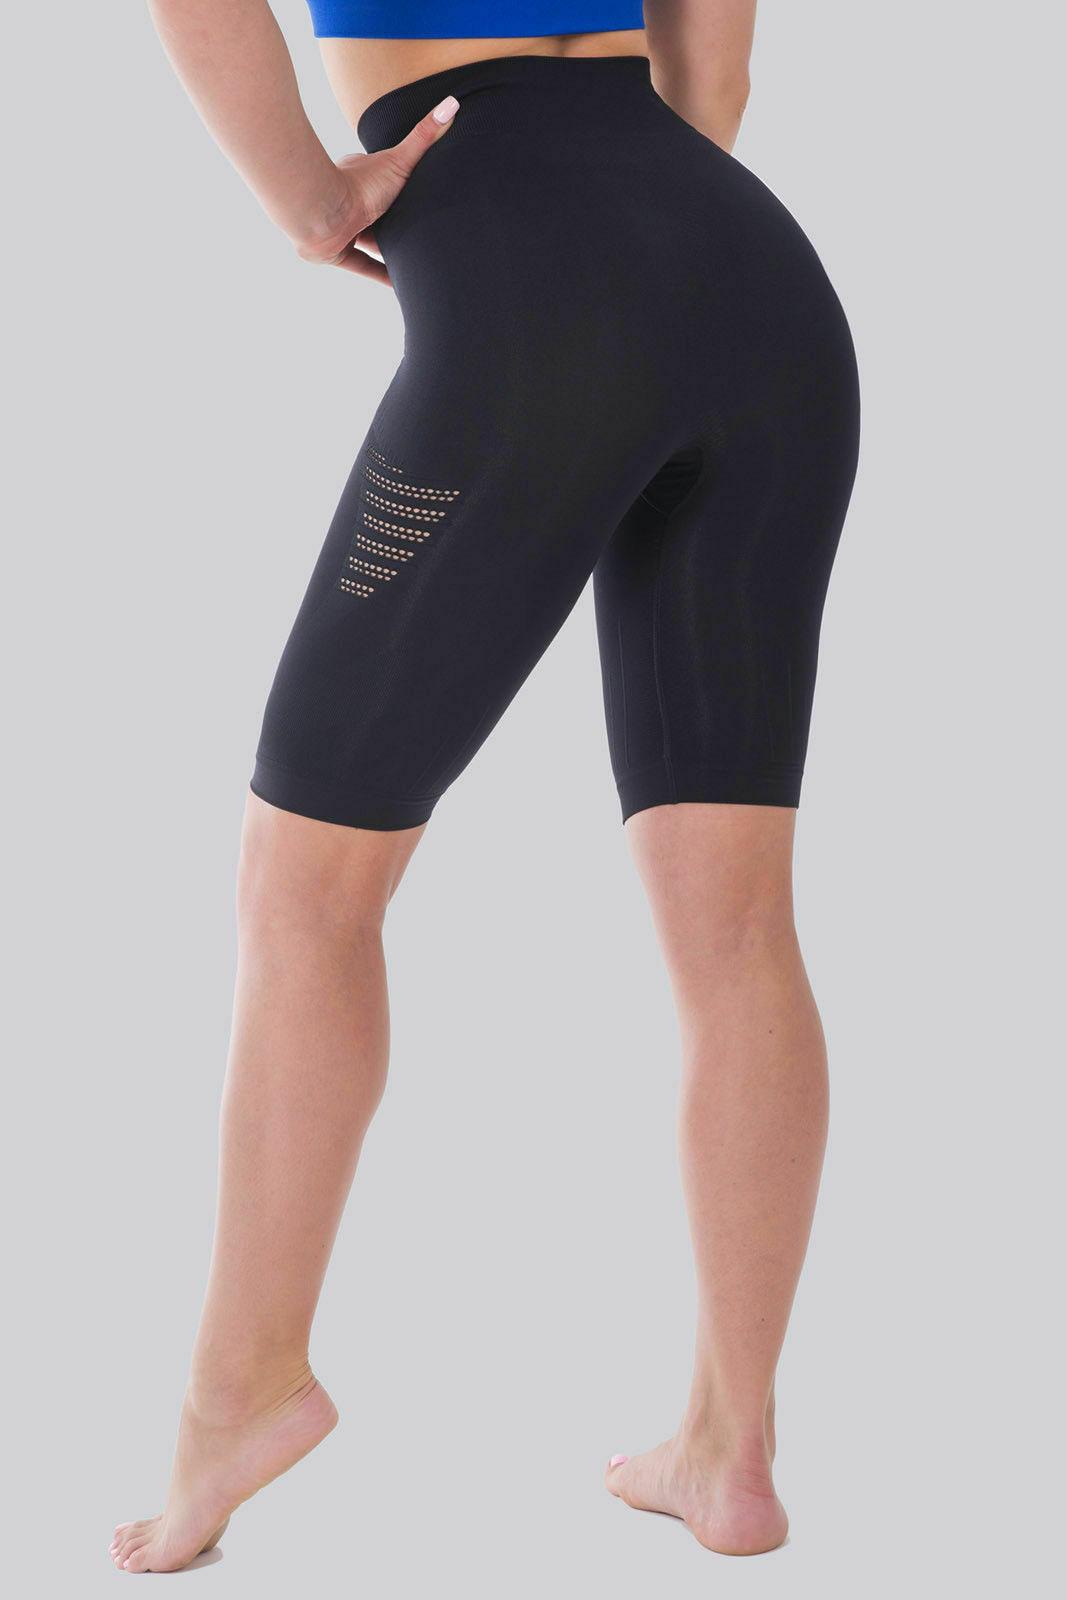 Bellissima-Women-039-s-Compression-Sport-Yoga-Shorts-High-Waist-Workout-Running thumbnail 17